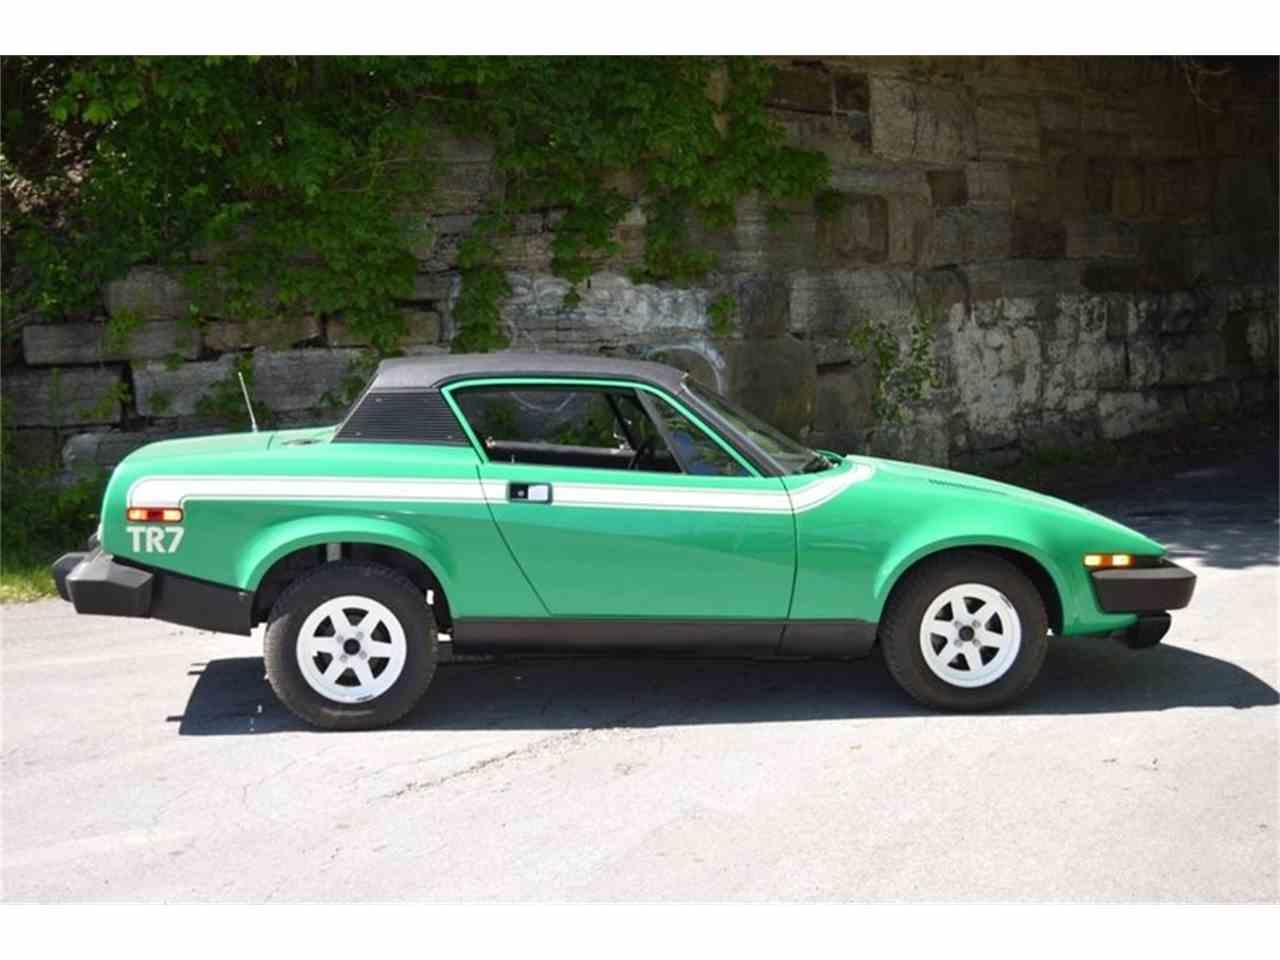 1976 Triumph TR7 for Sale   ClassicCars.com   CC-1016747